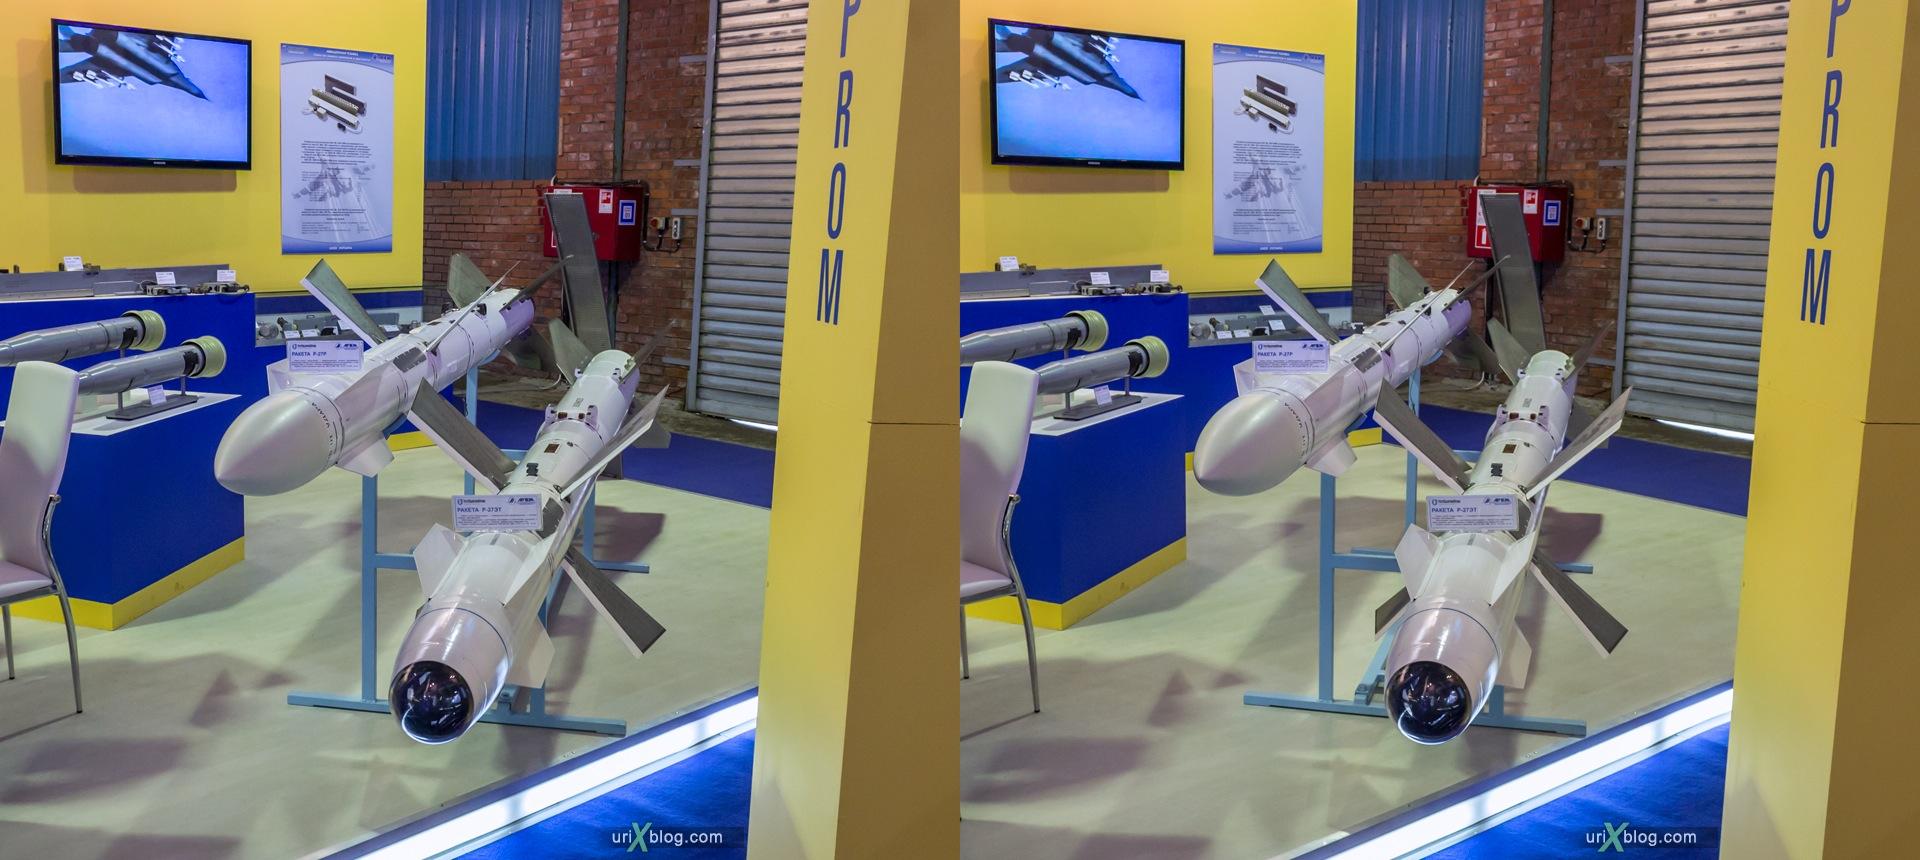 2013, MAKS, International Aviation and Space Salon, Russia, Ramenskoye airfield, pavilion, hall, 3D, stereo pair, cross-eyed, crossview, cross view stereo pair, stereoscopic